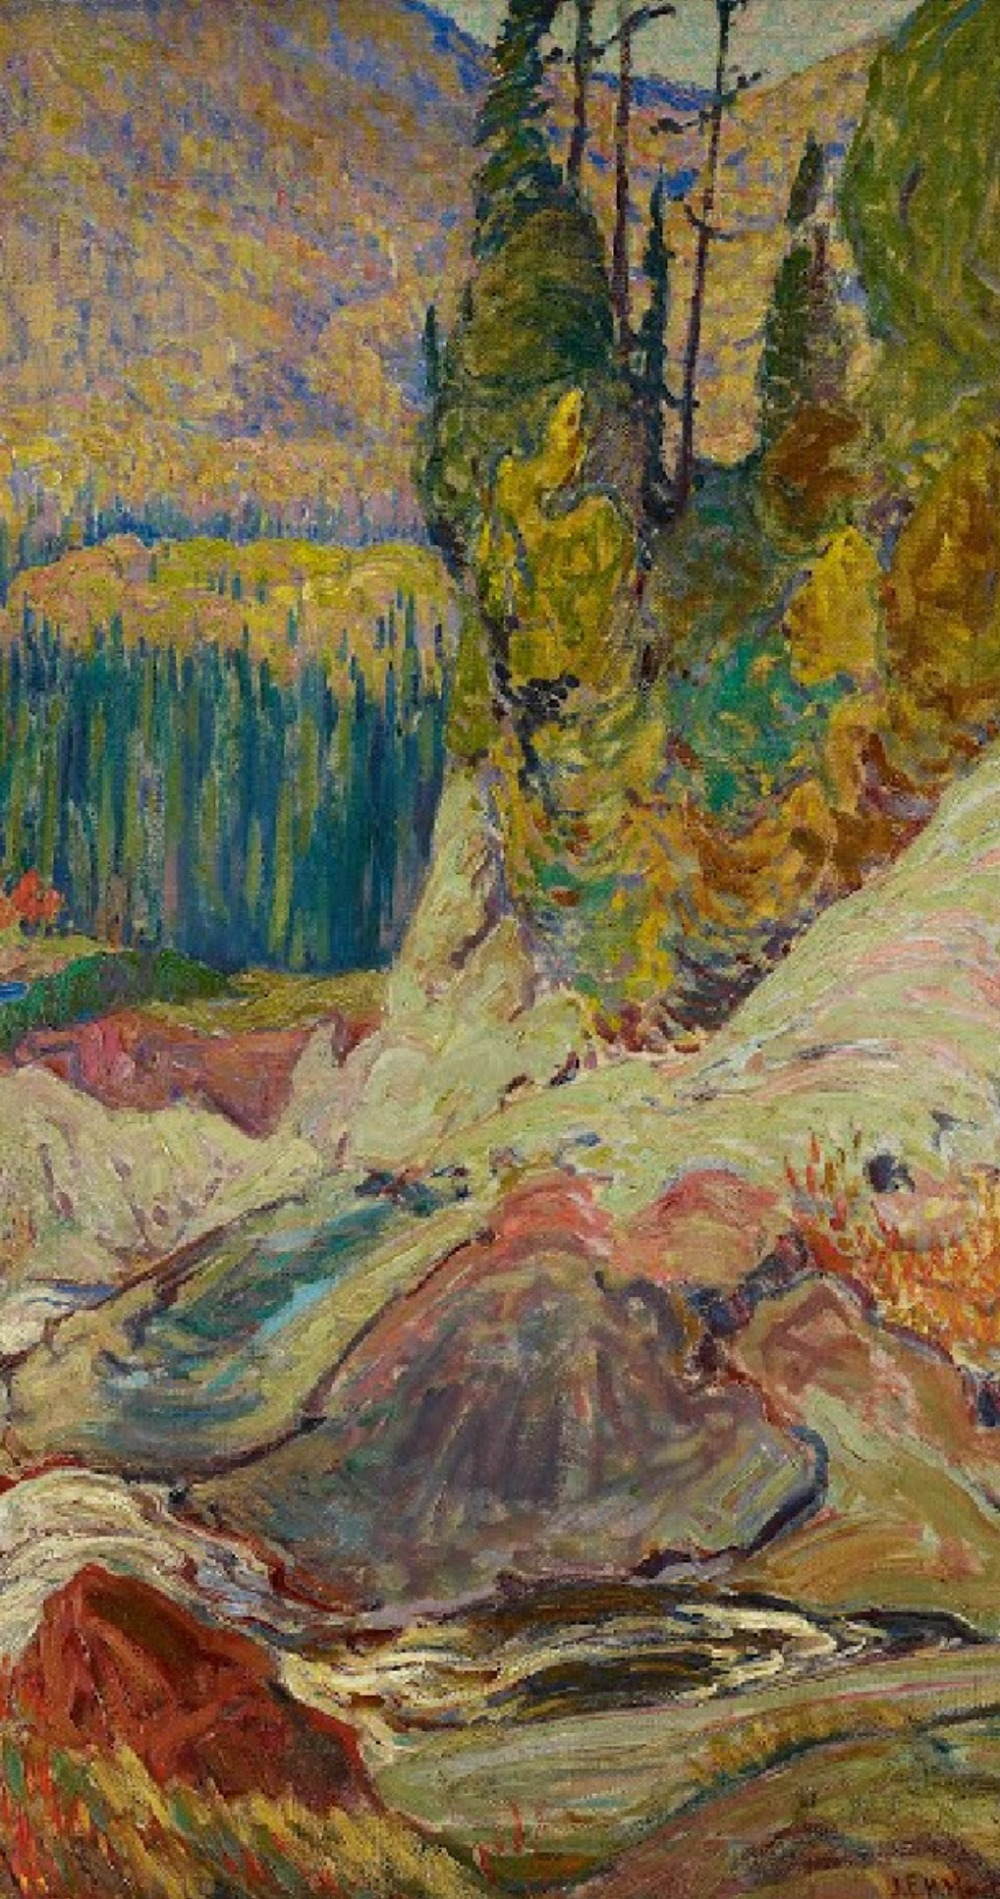 pScreenshot_2018-12-21 Screenshot_2018-12-17-Art-Gallery-of-Ontario-Google-Arts-Culture jpg (JPEG Image, 1467 × 1170 pixels)[...]